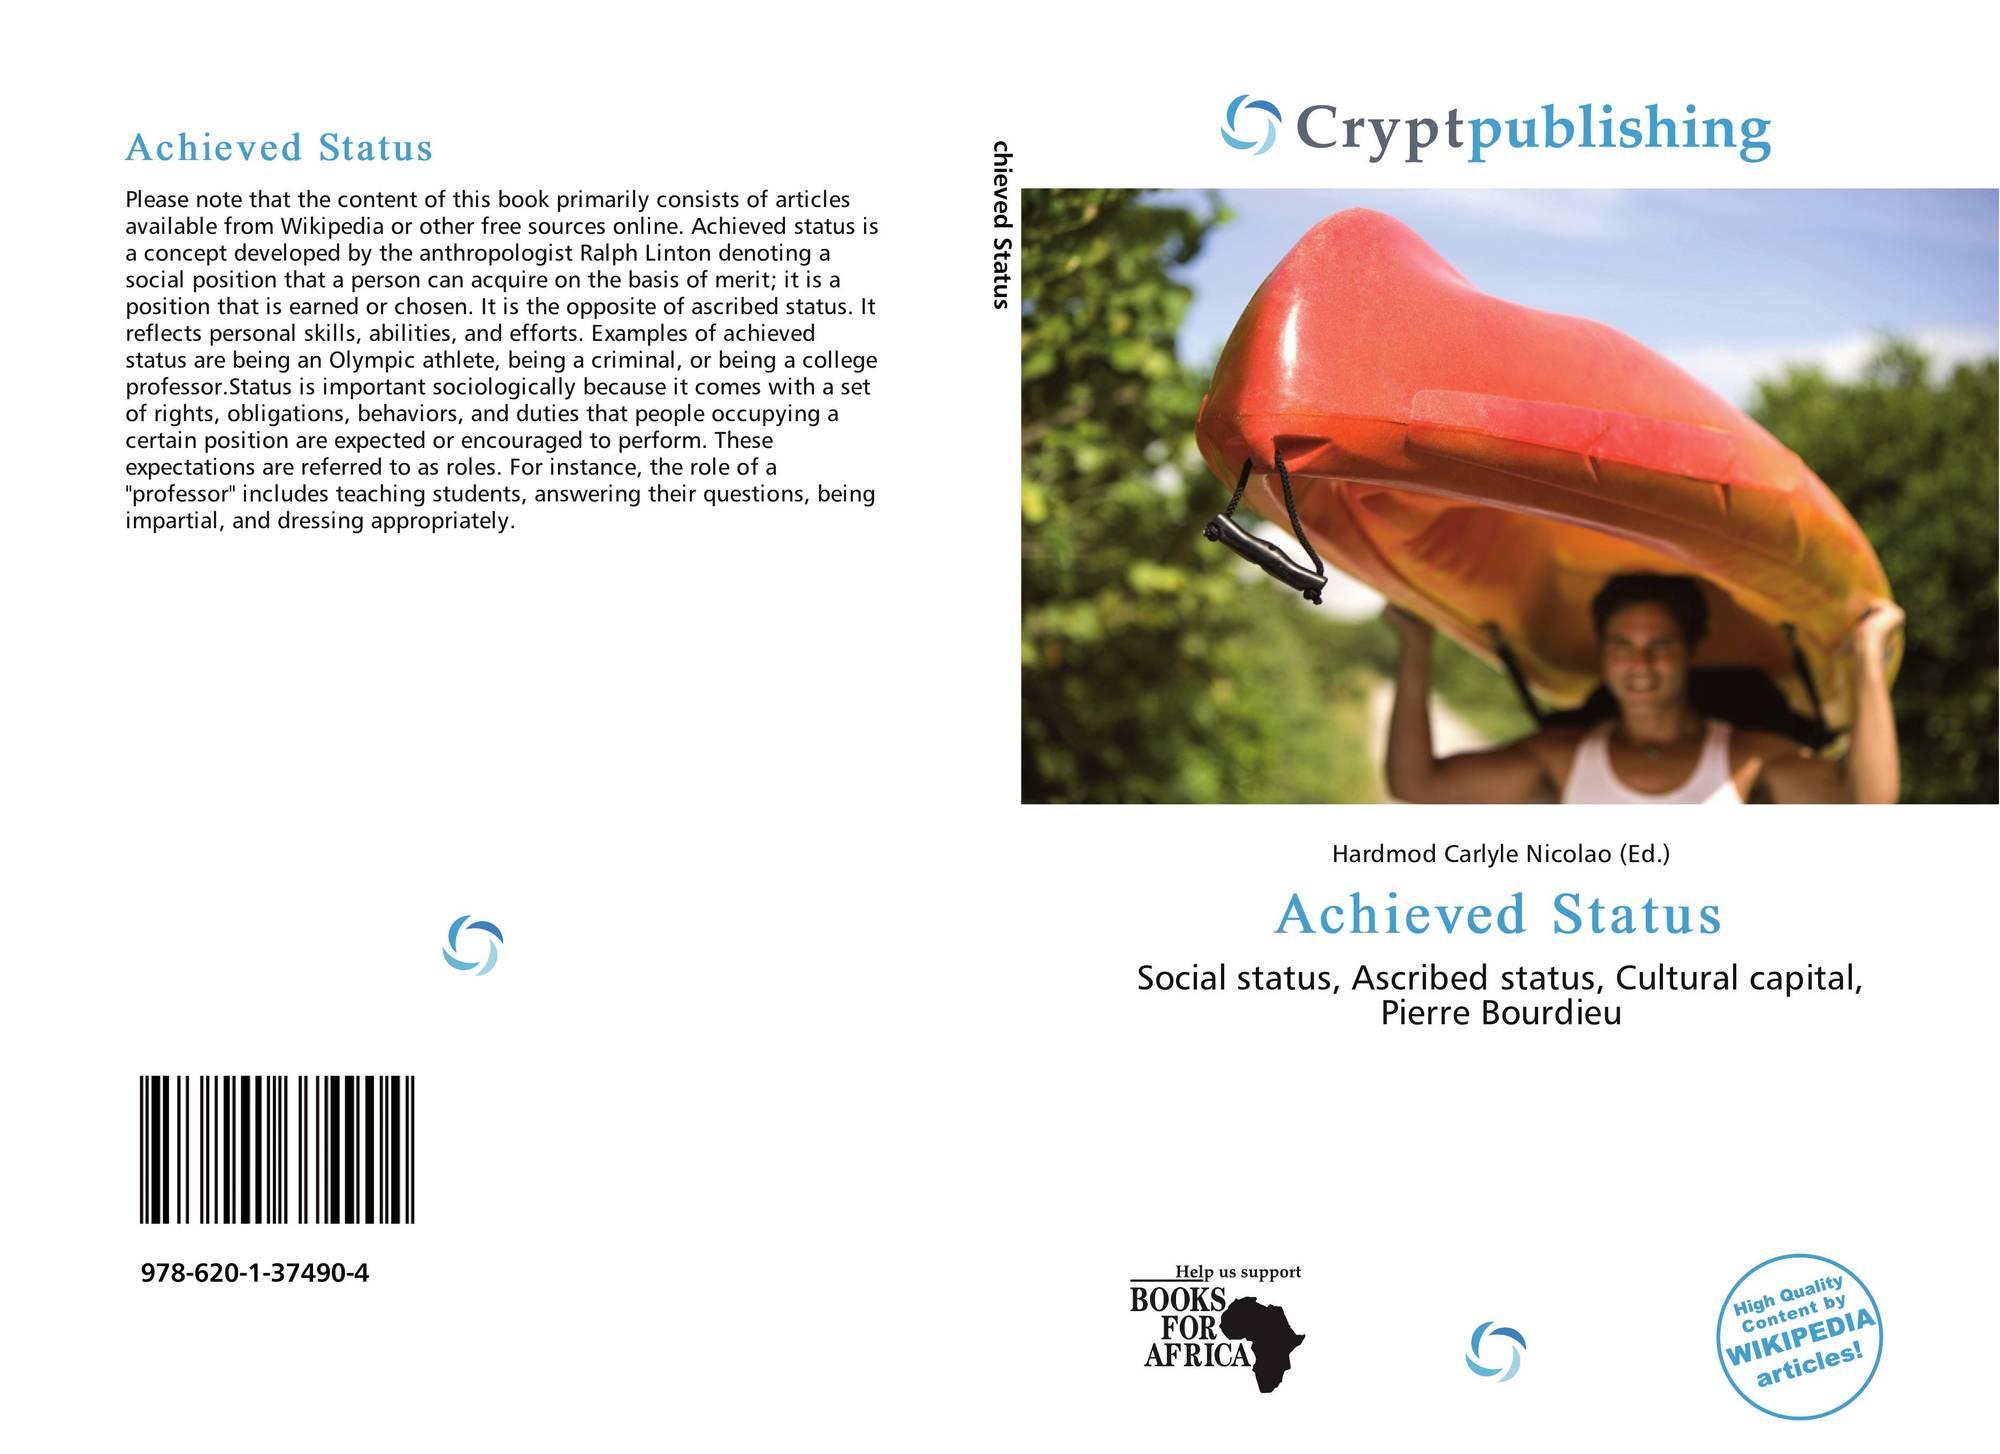 ascribed status and achieved status